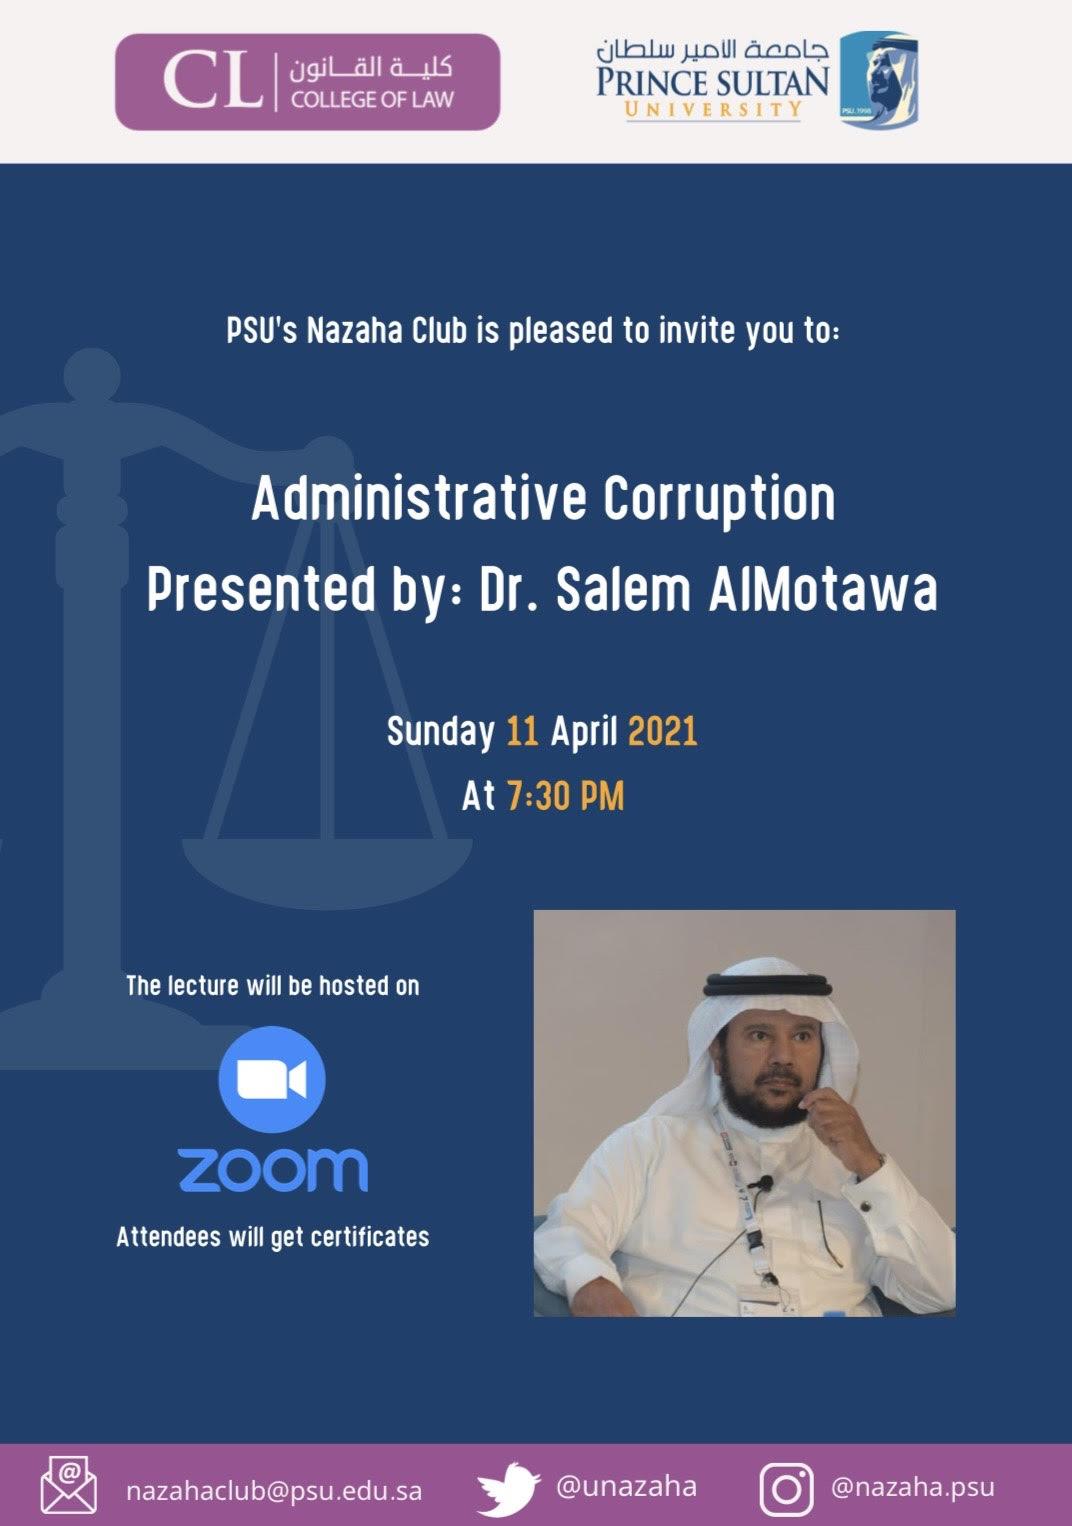 Administrative Corruption presented by: Dr.Salem Almotawa